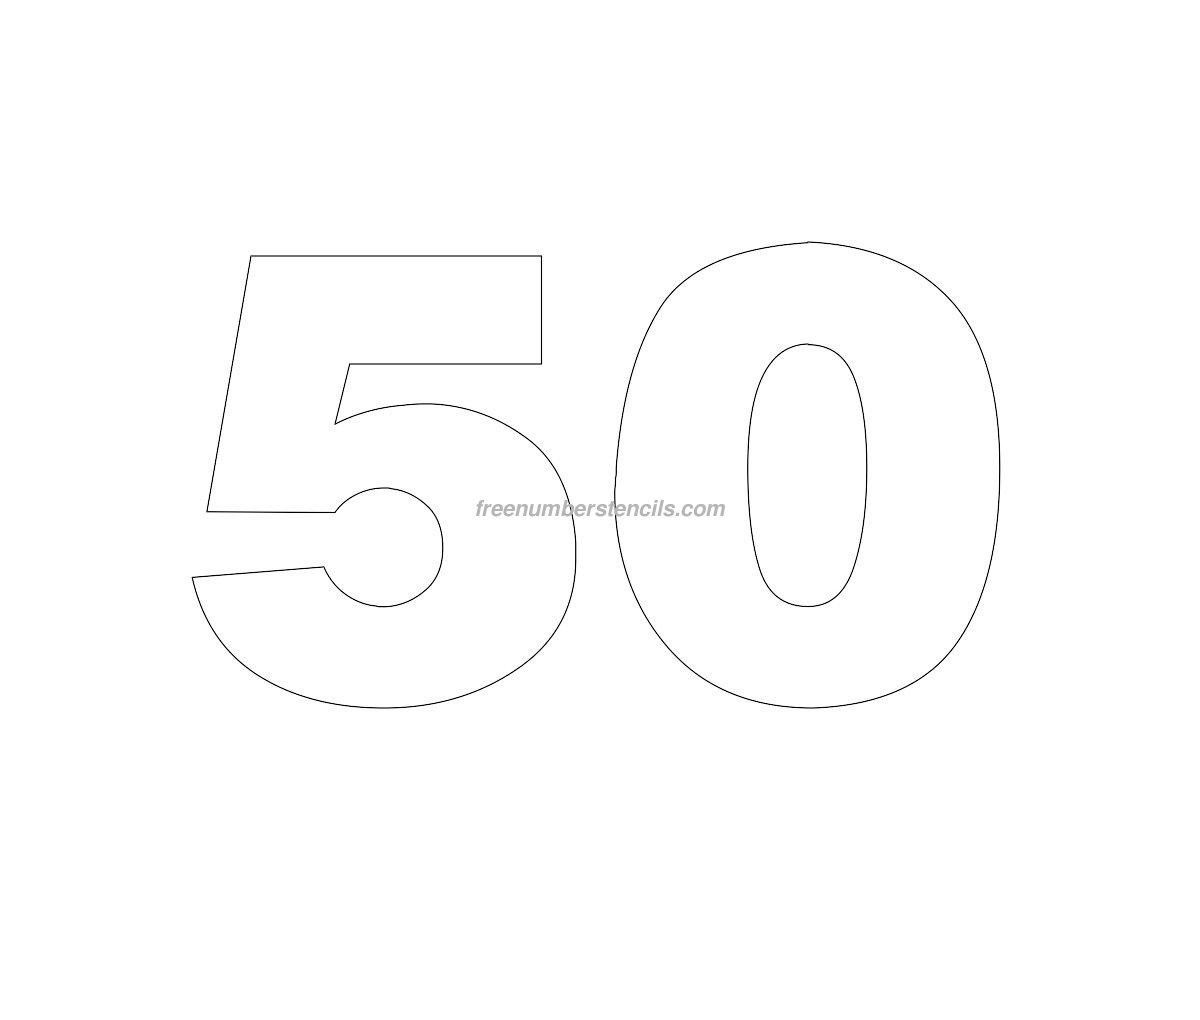 Free Helvetica 50 Number Stencil Freenumberstencils